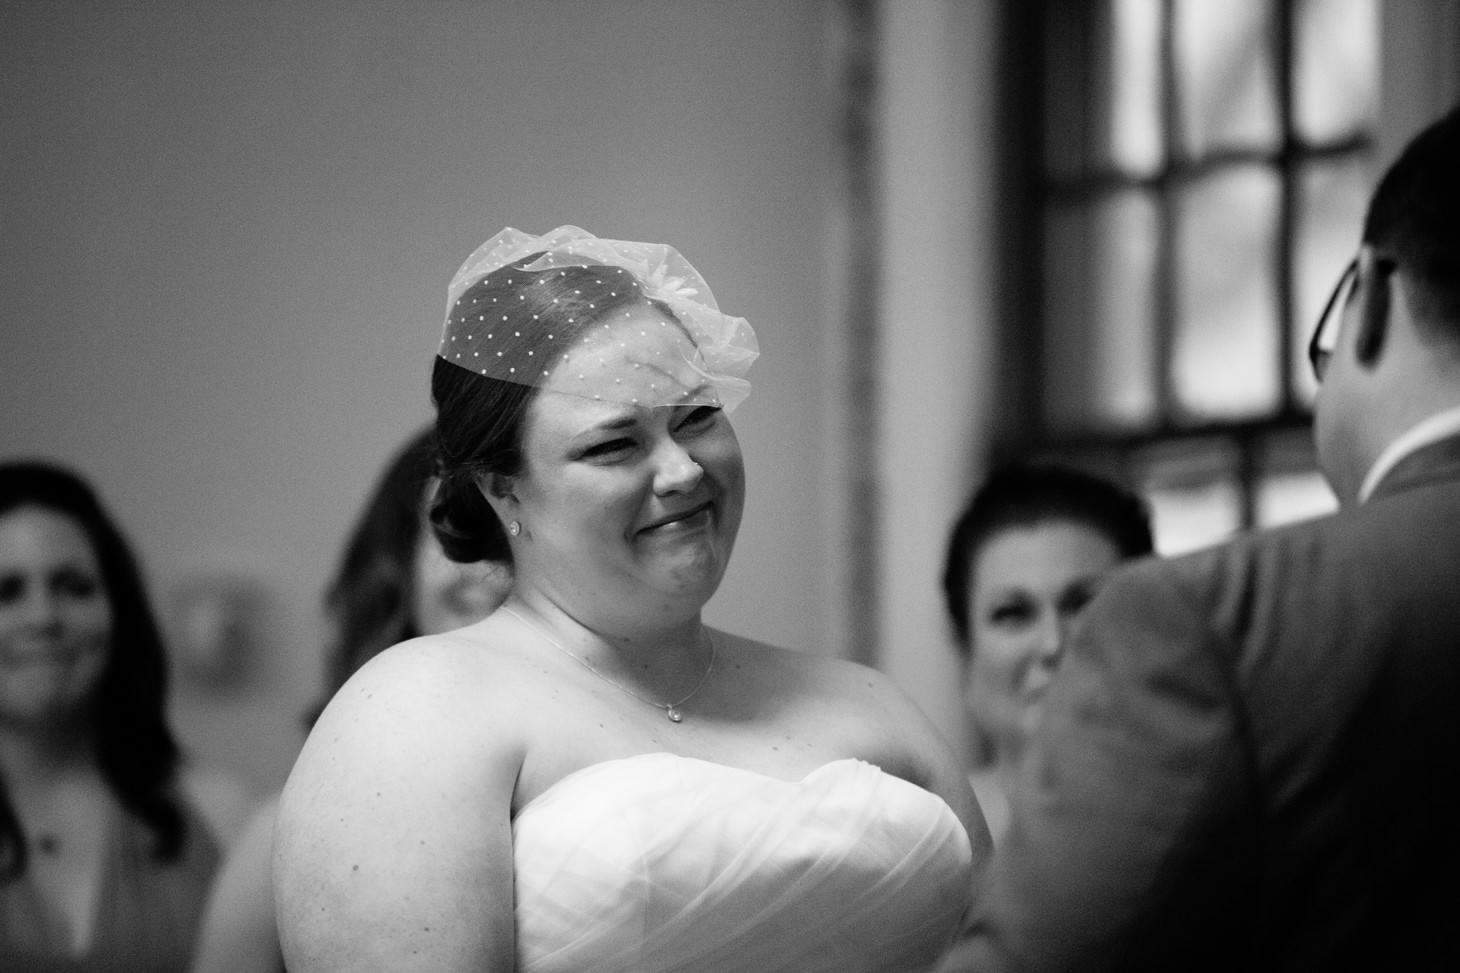 nyc-brooklyn-prospect-park-picnic-house-wedding-smitten-chickens-nerdy-36.jpg